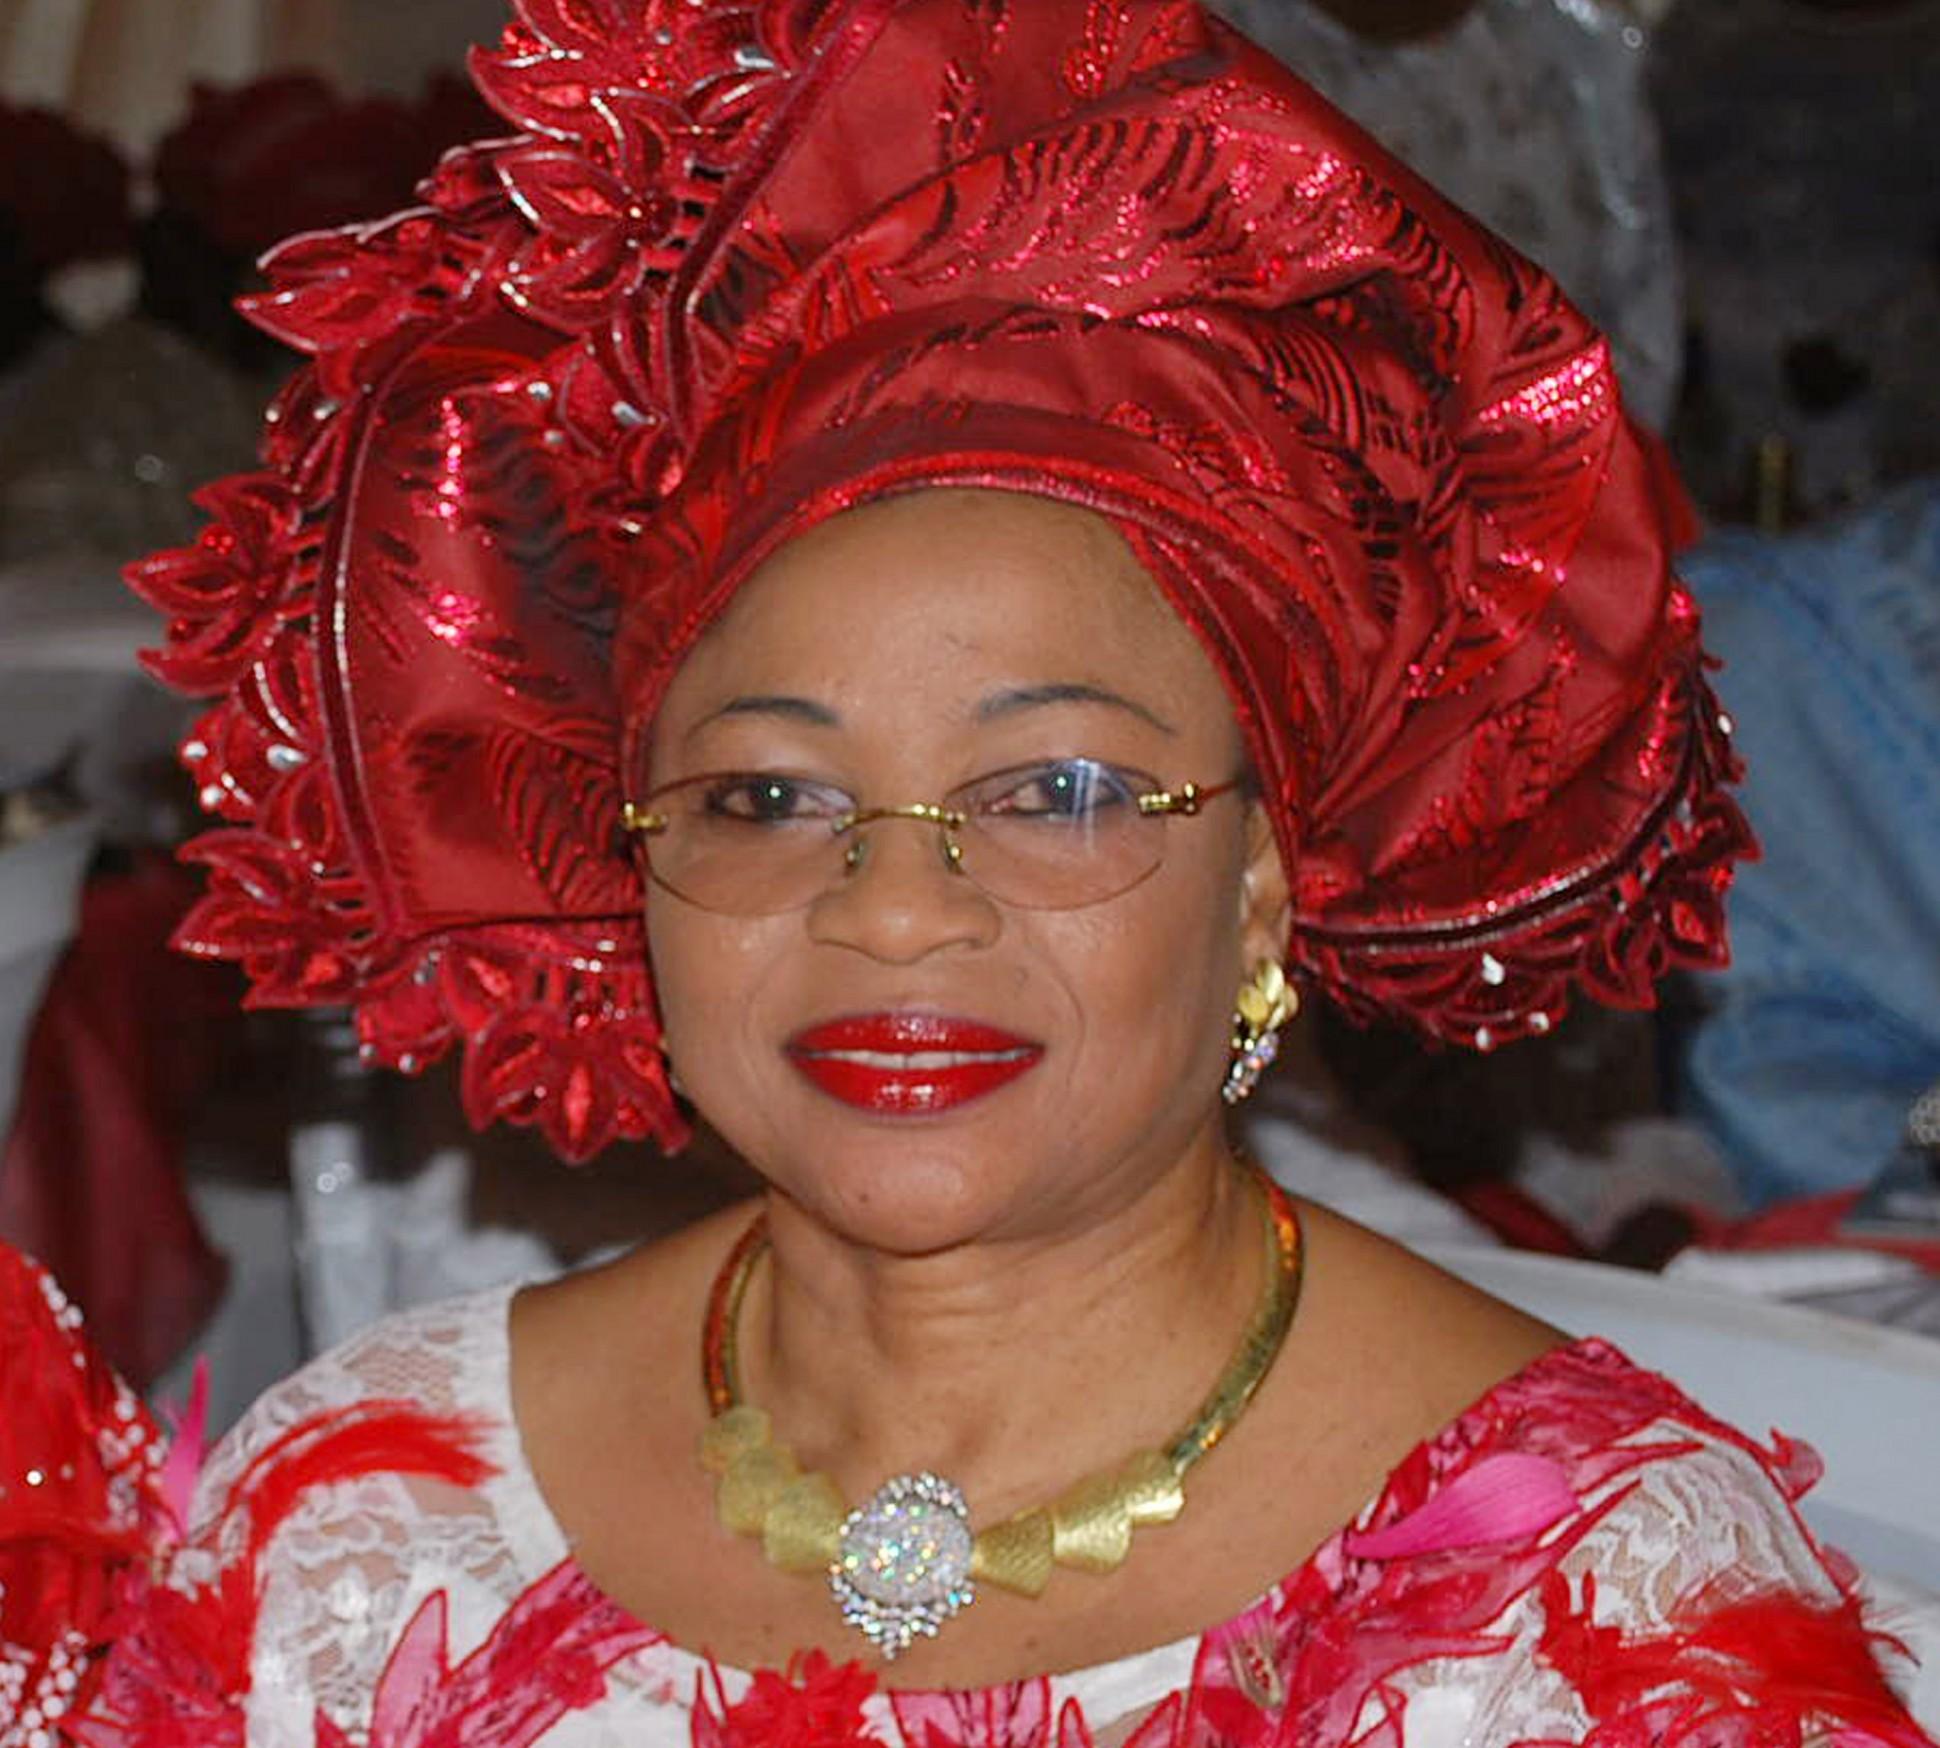 MEET THE RICHEST WOMAN IN NIGERIA - FOLORUNSHO ALAKIJA